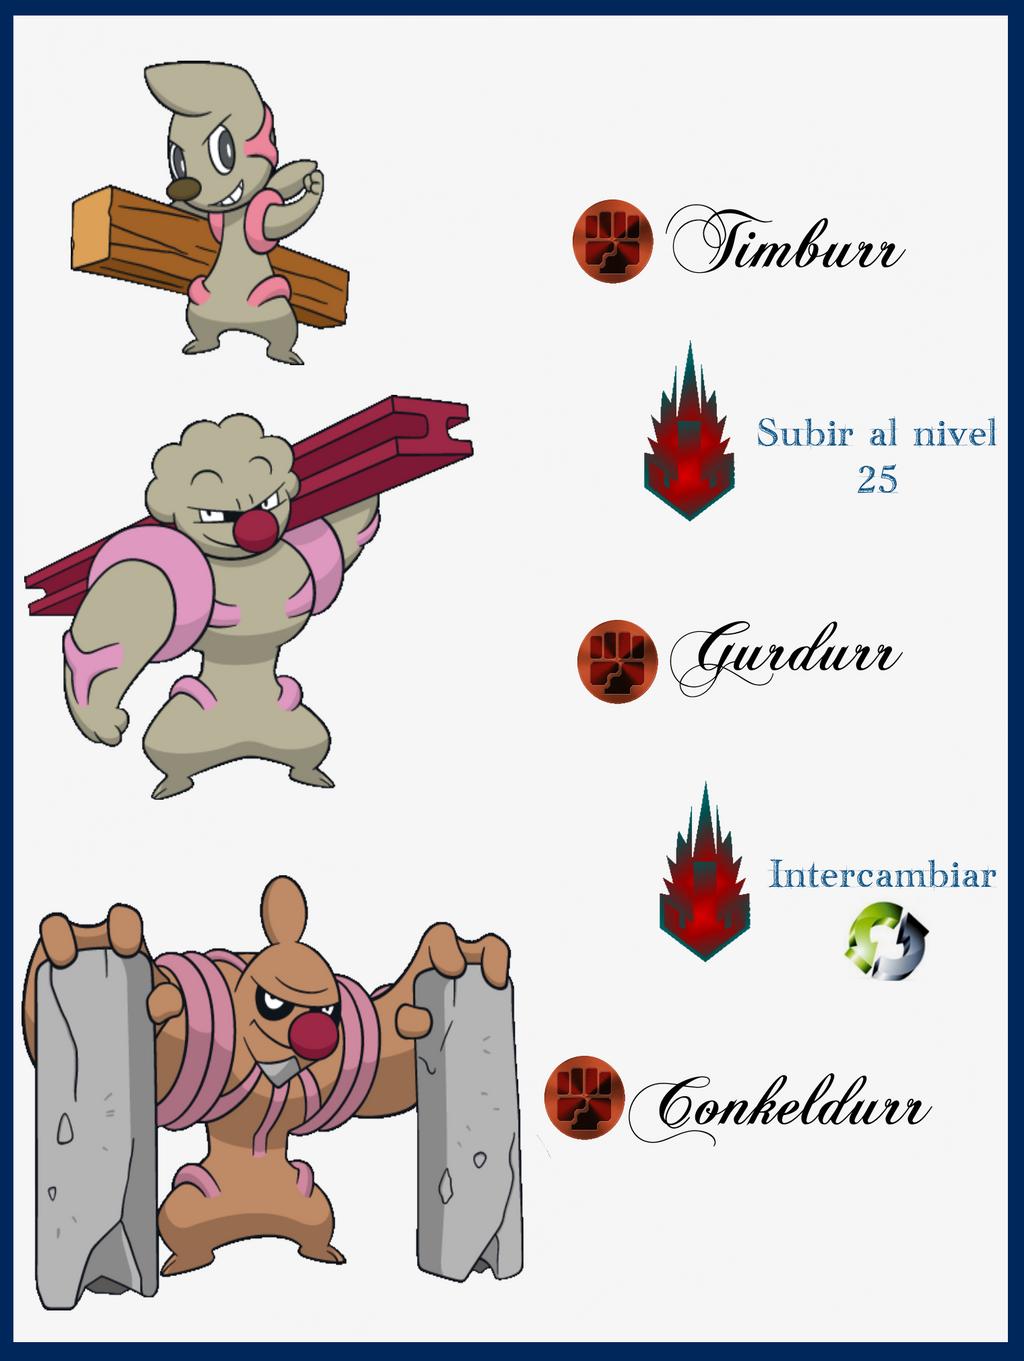 229 timburr evoluciones by maxconnery on deviantart